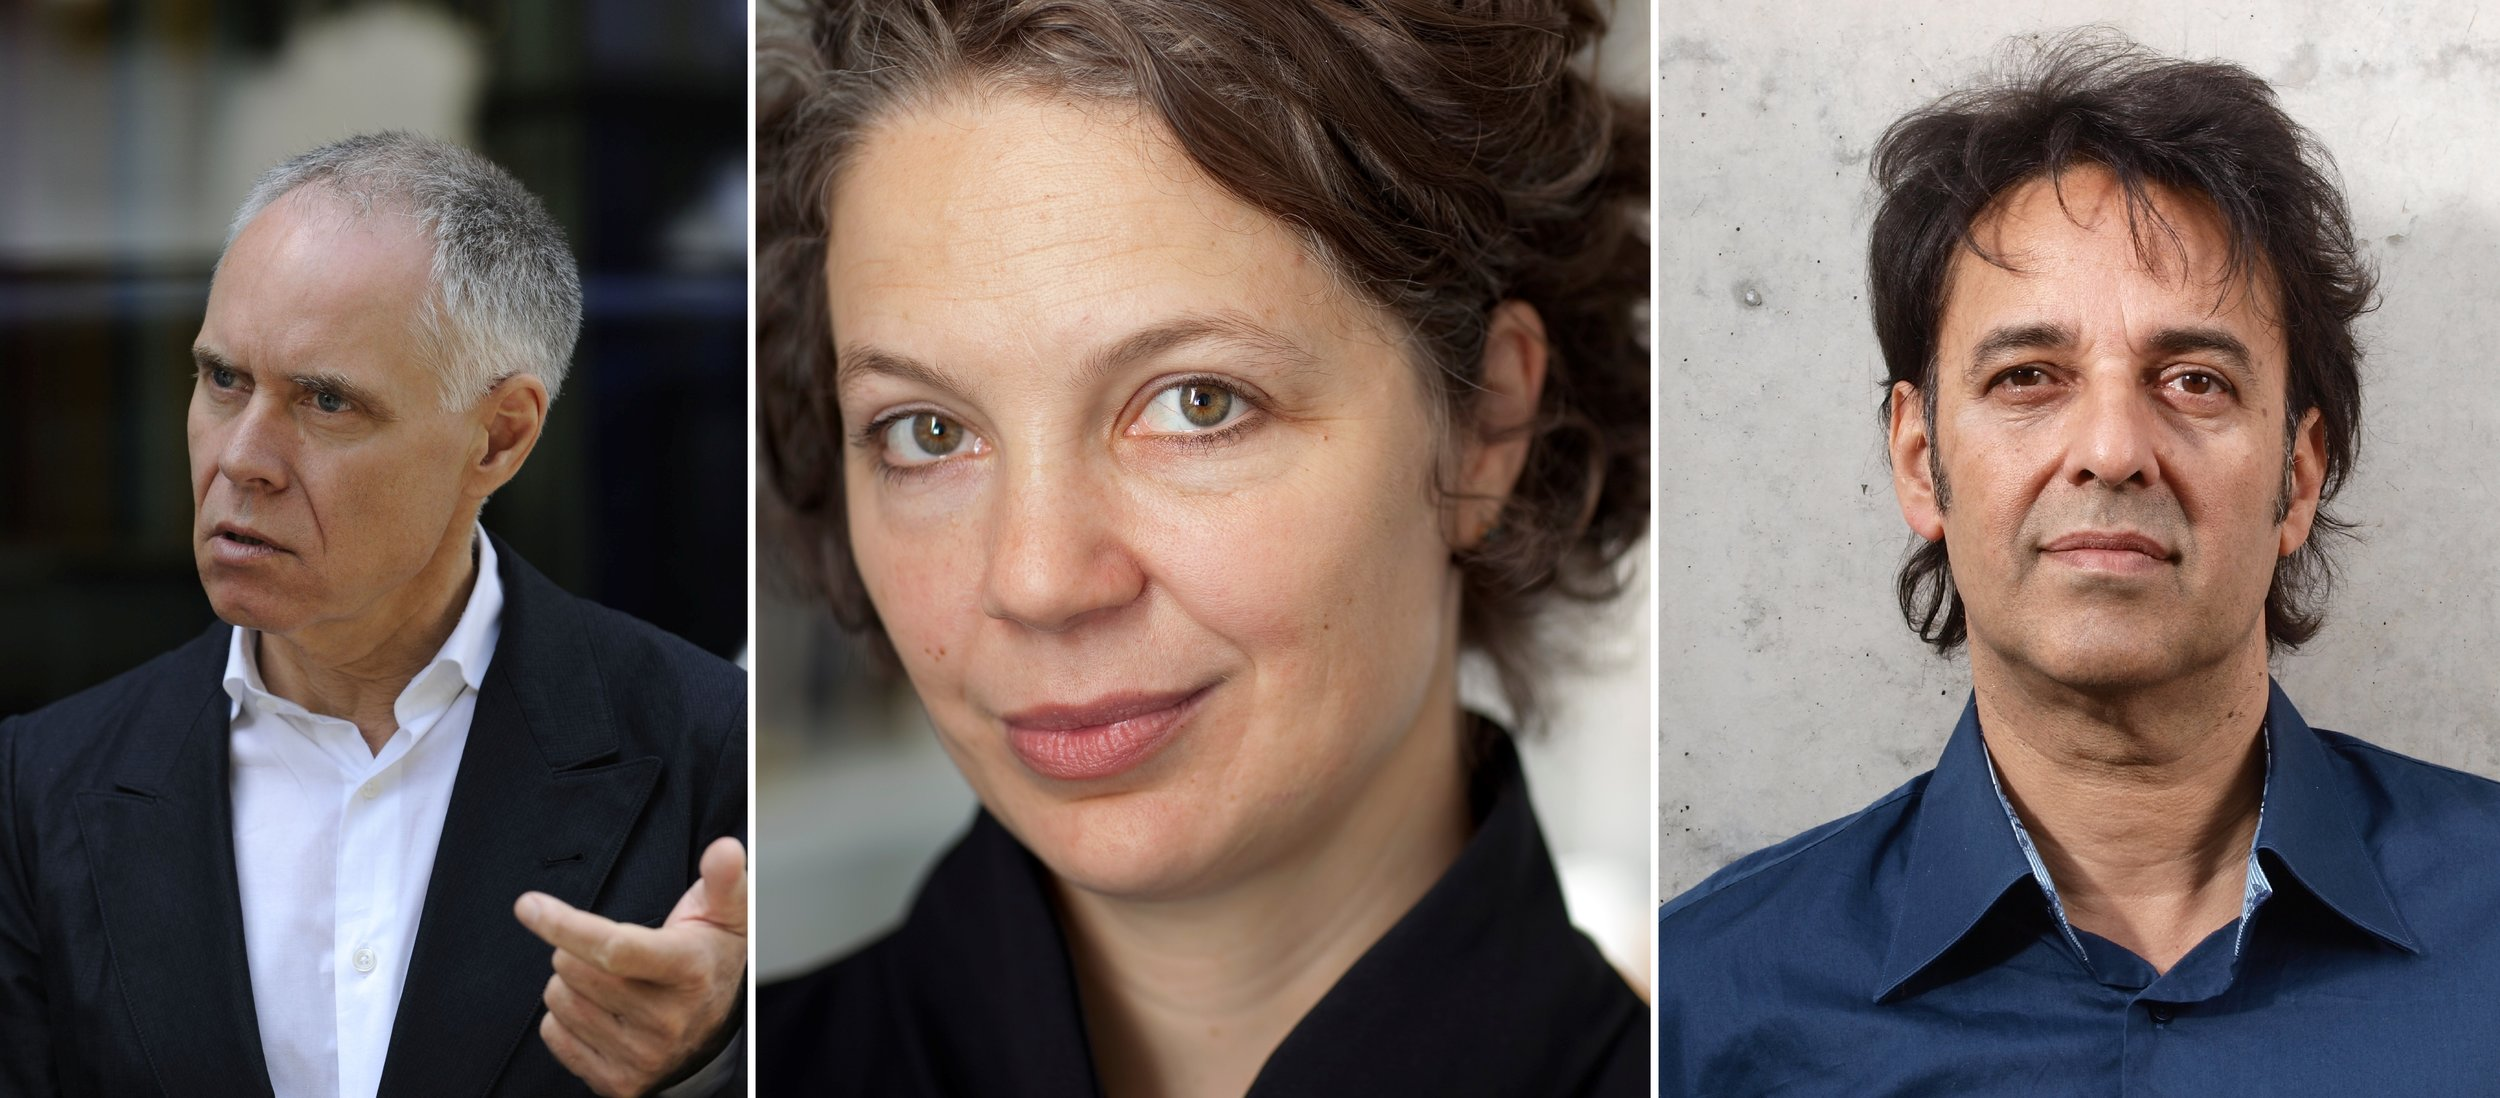 V.l.n.r.: Moritz Leuenberger (zVg); Nadj Abonji (Gaëtan Bally); Martin R. Dean (Claude Giger).